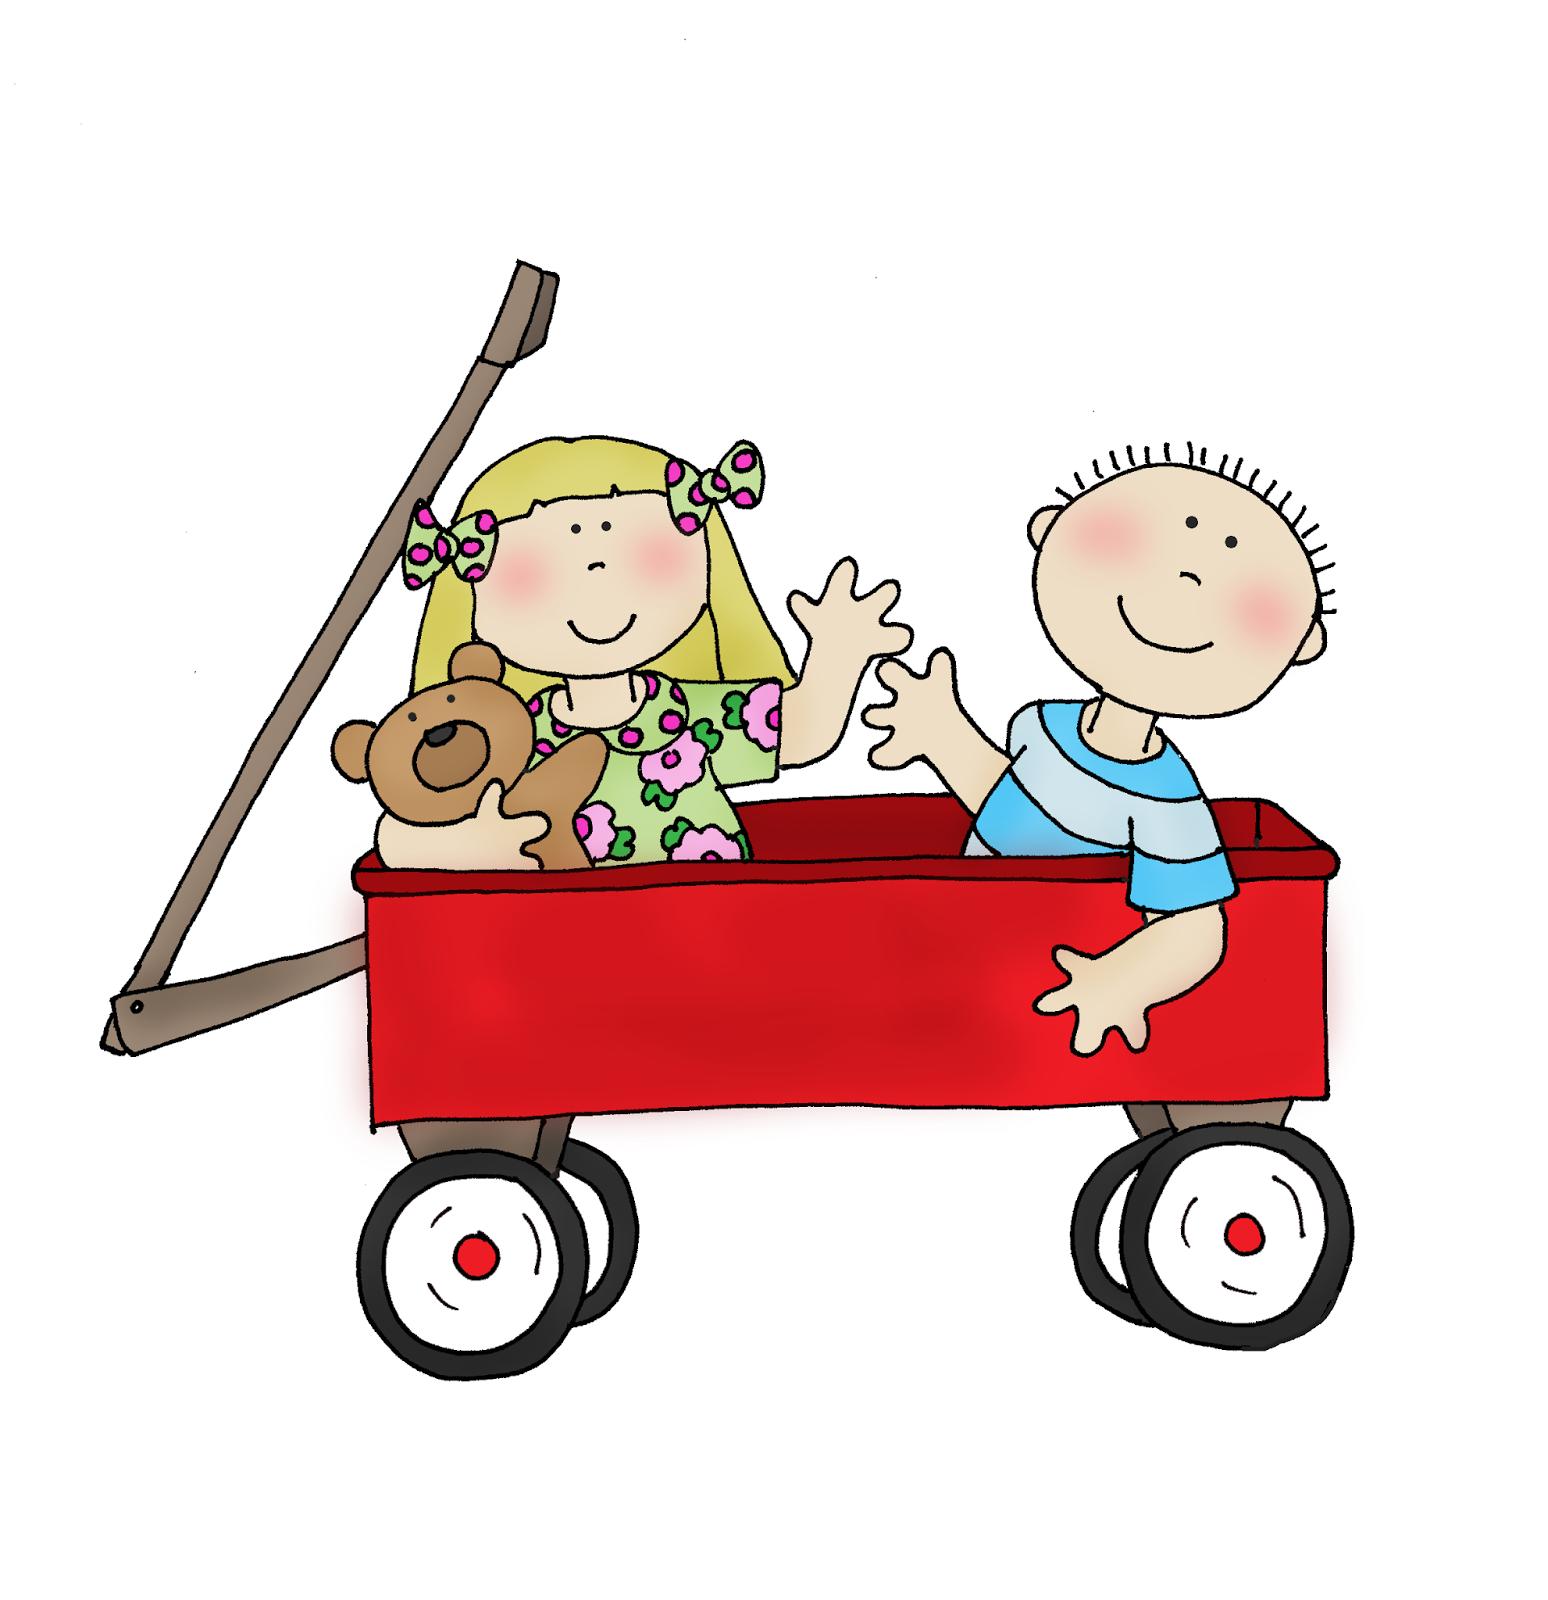 Wagon clipart little red wagon. Lil dearie dolls digi